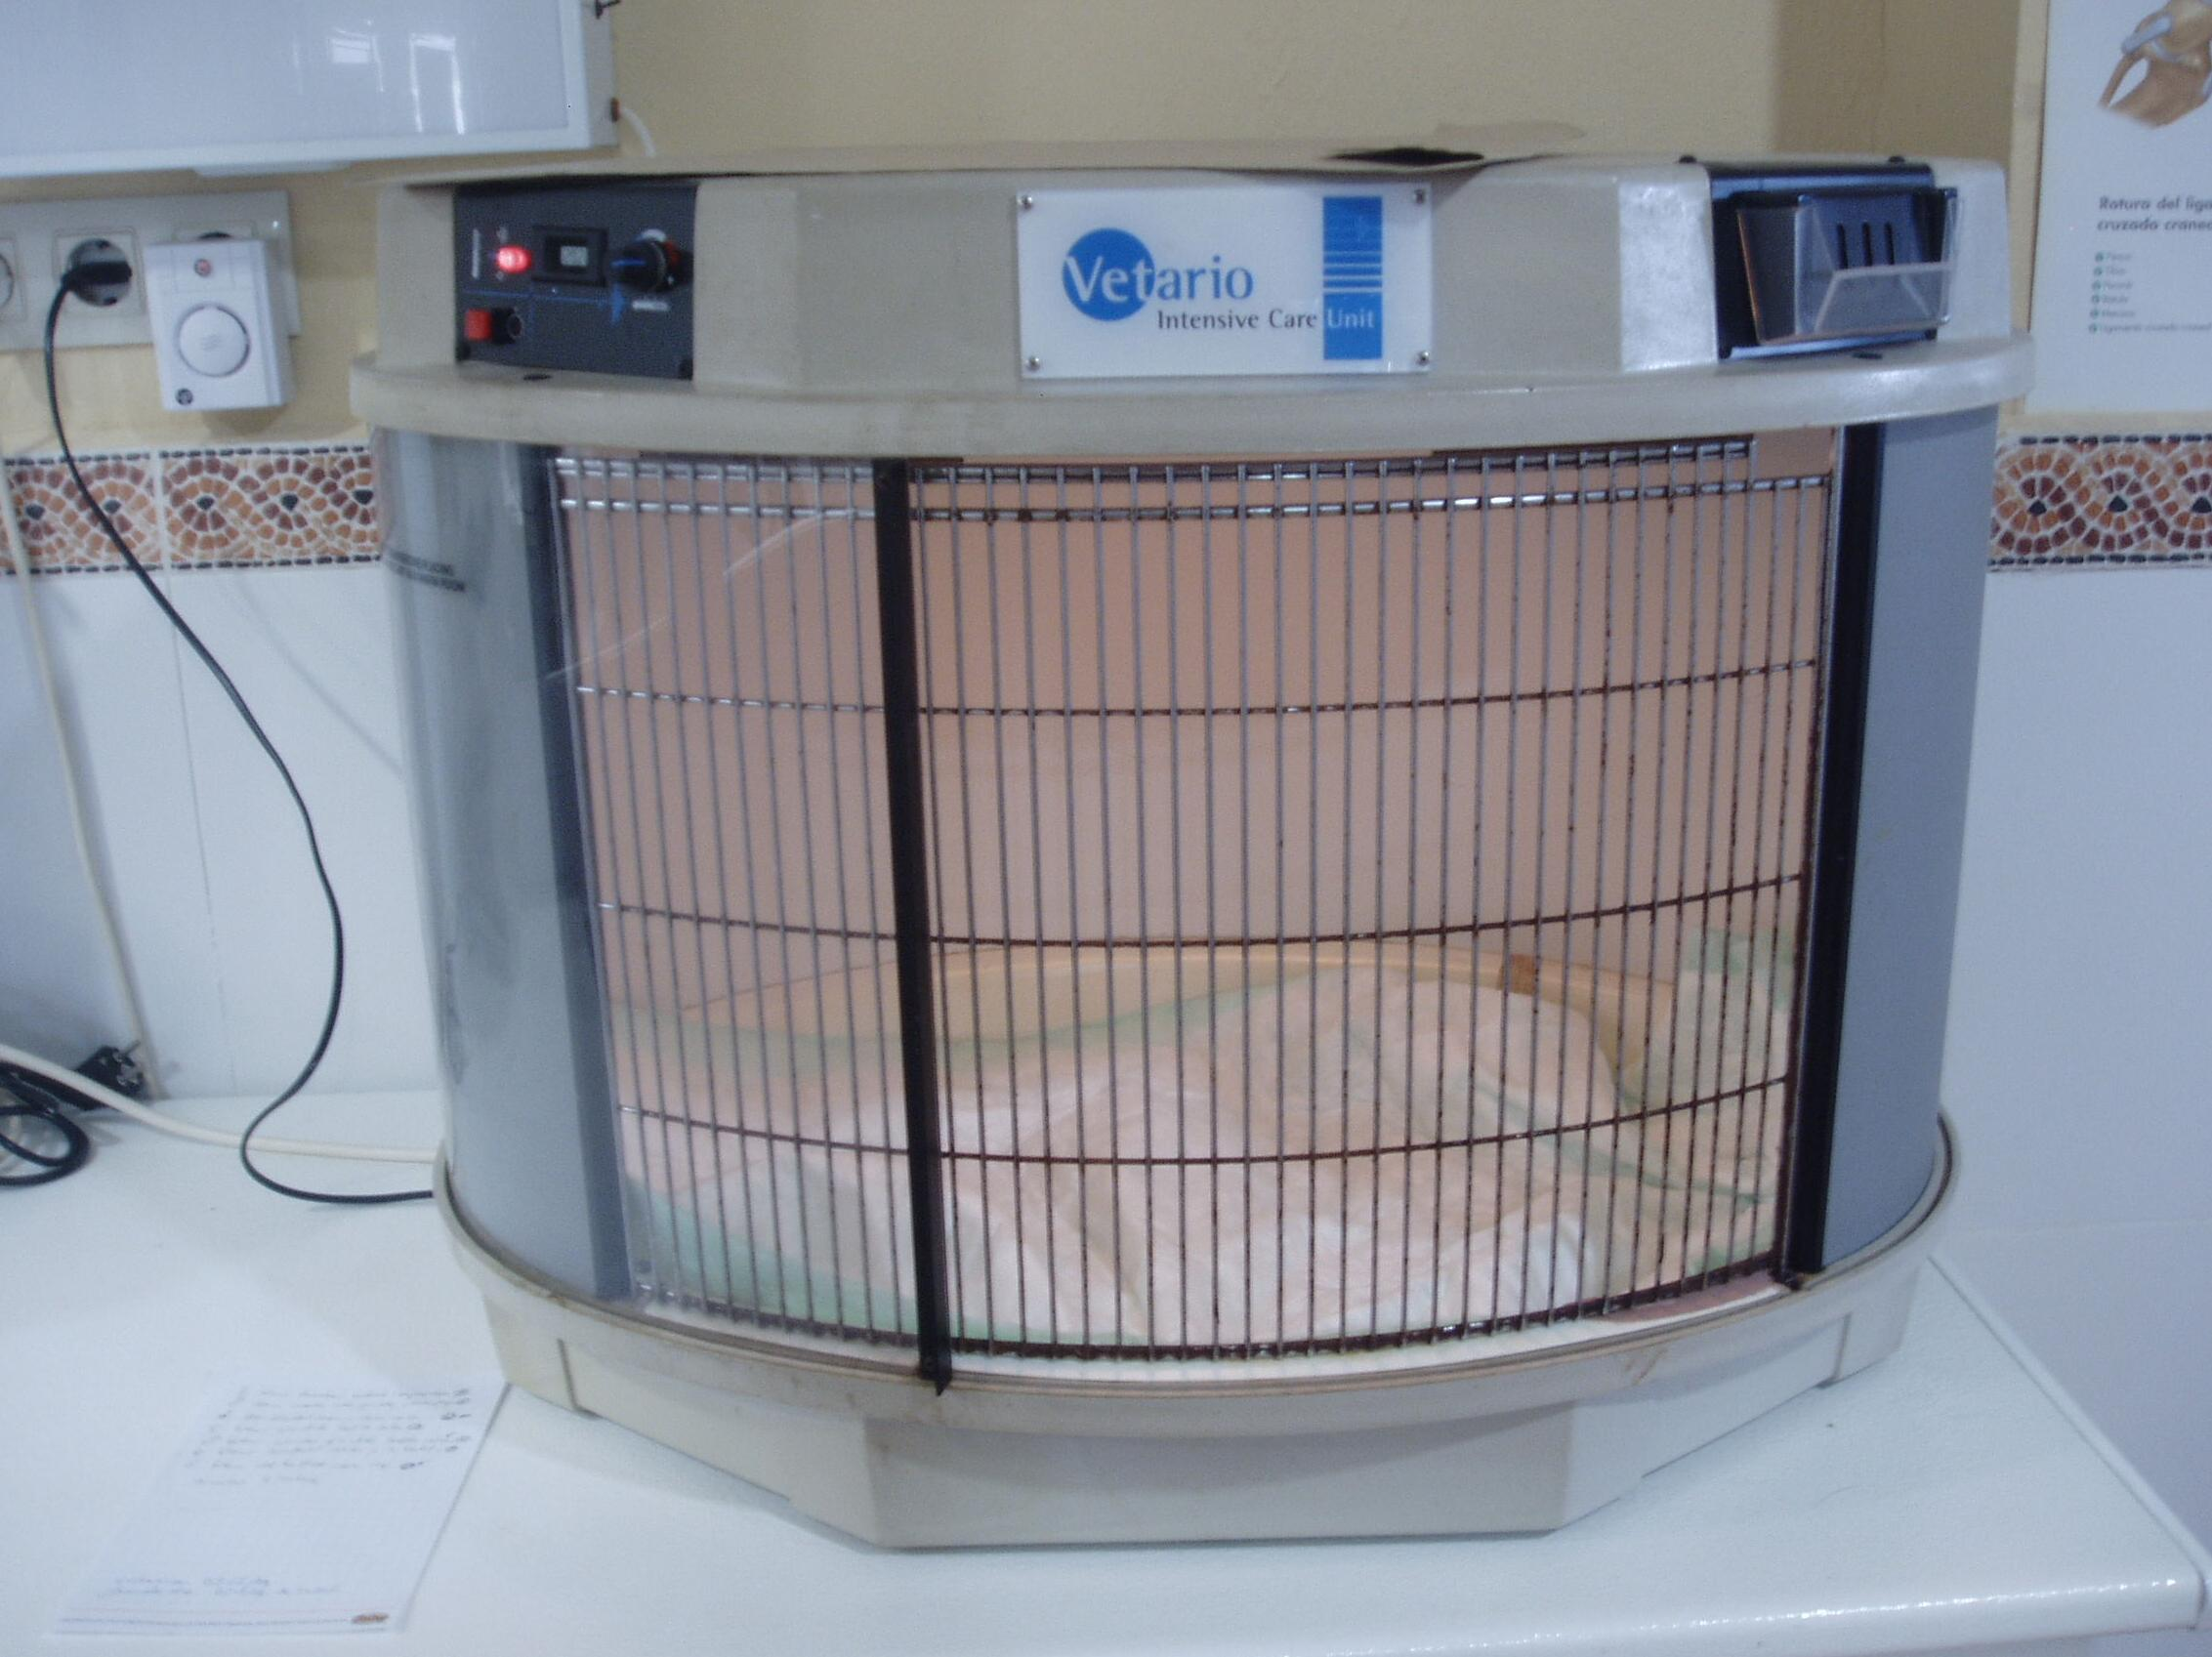 incubadora con temperatura controlada y aporte de oxigeno, para atender a cachorritos recien nacidos o pacientes críticos